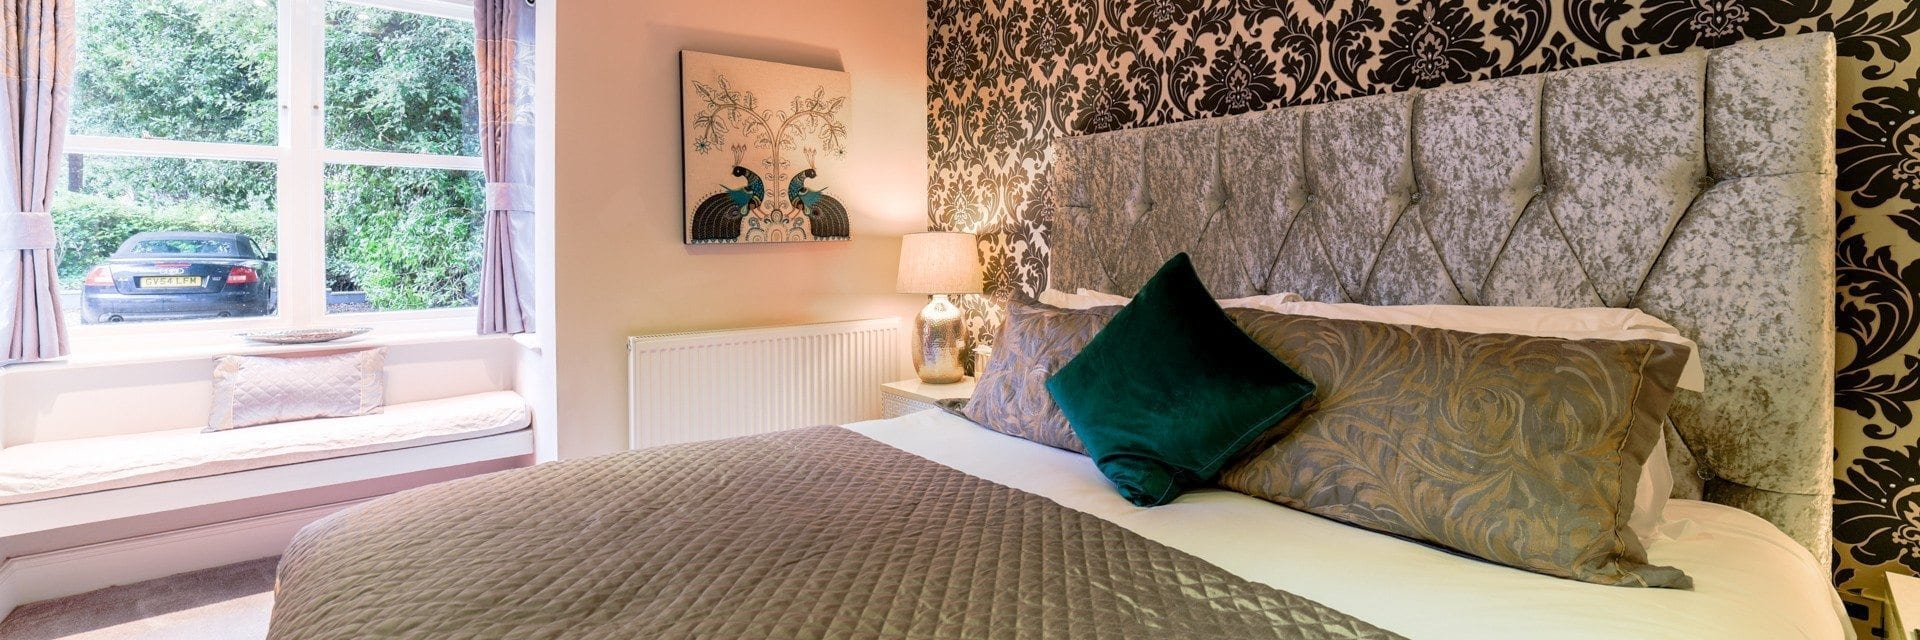 Salisbury Bedroom Derby Manor